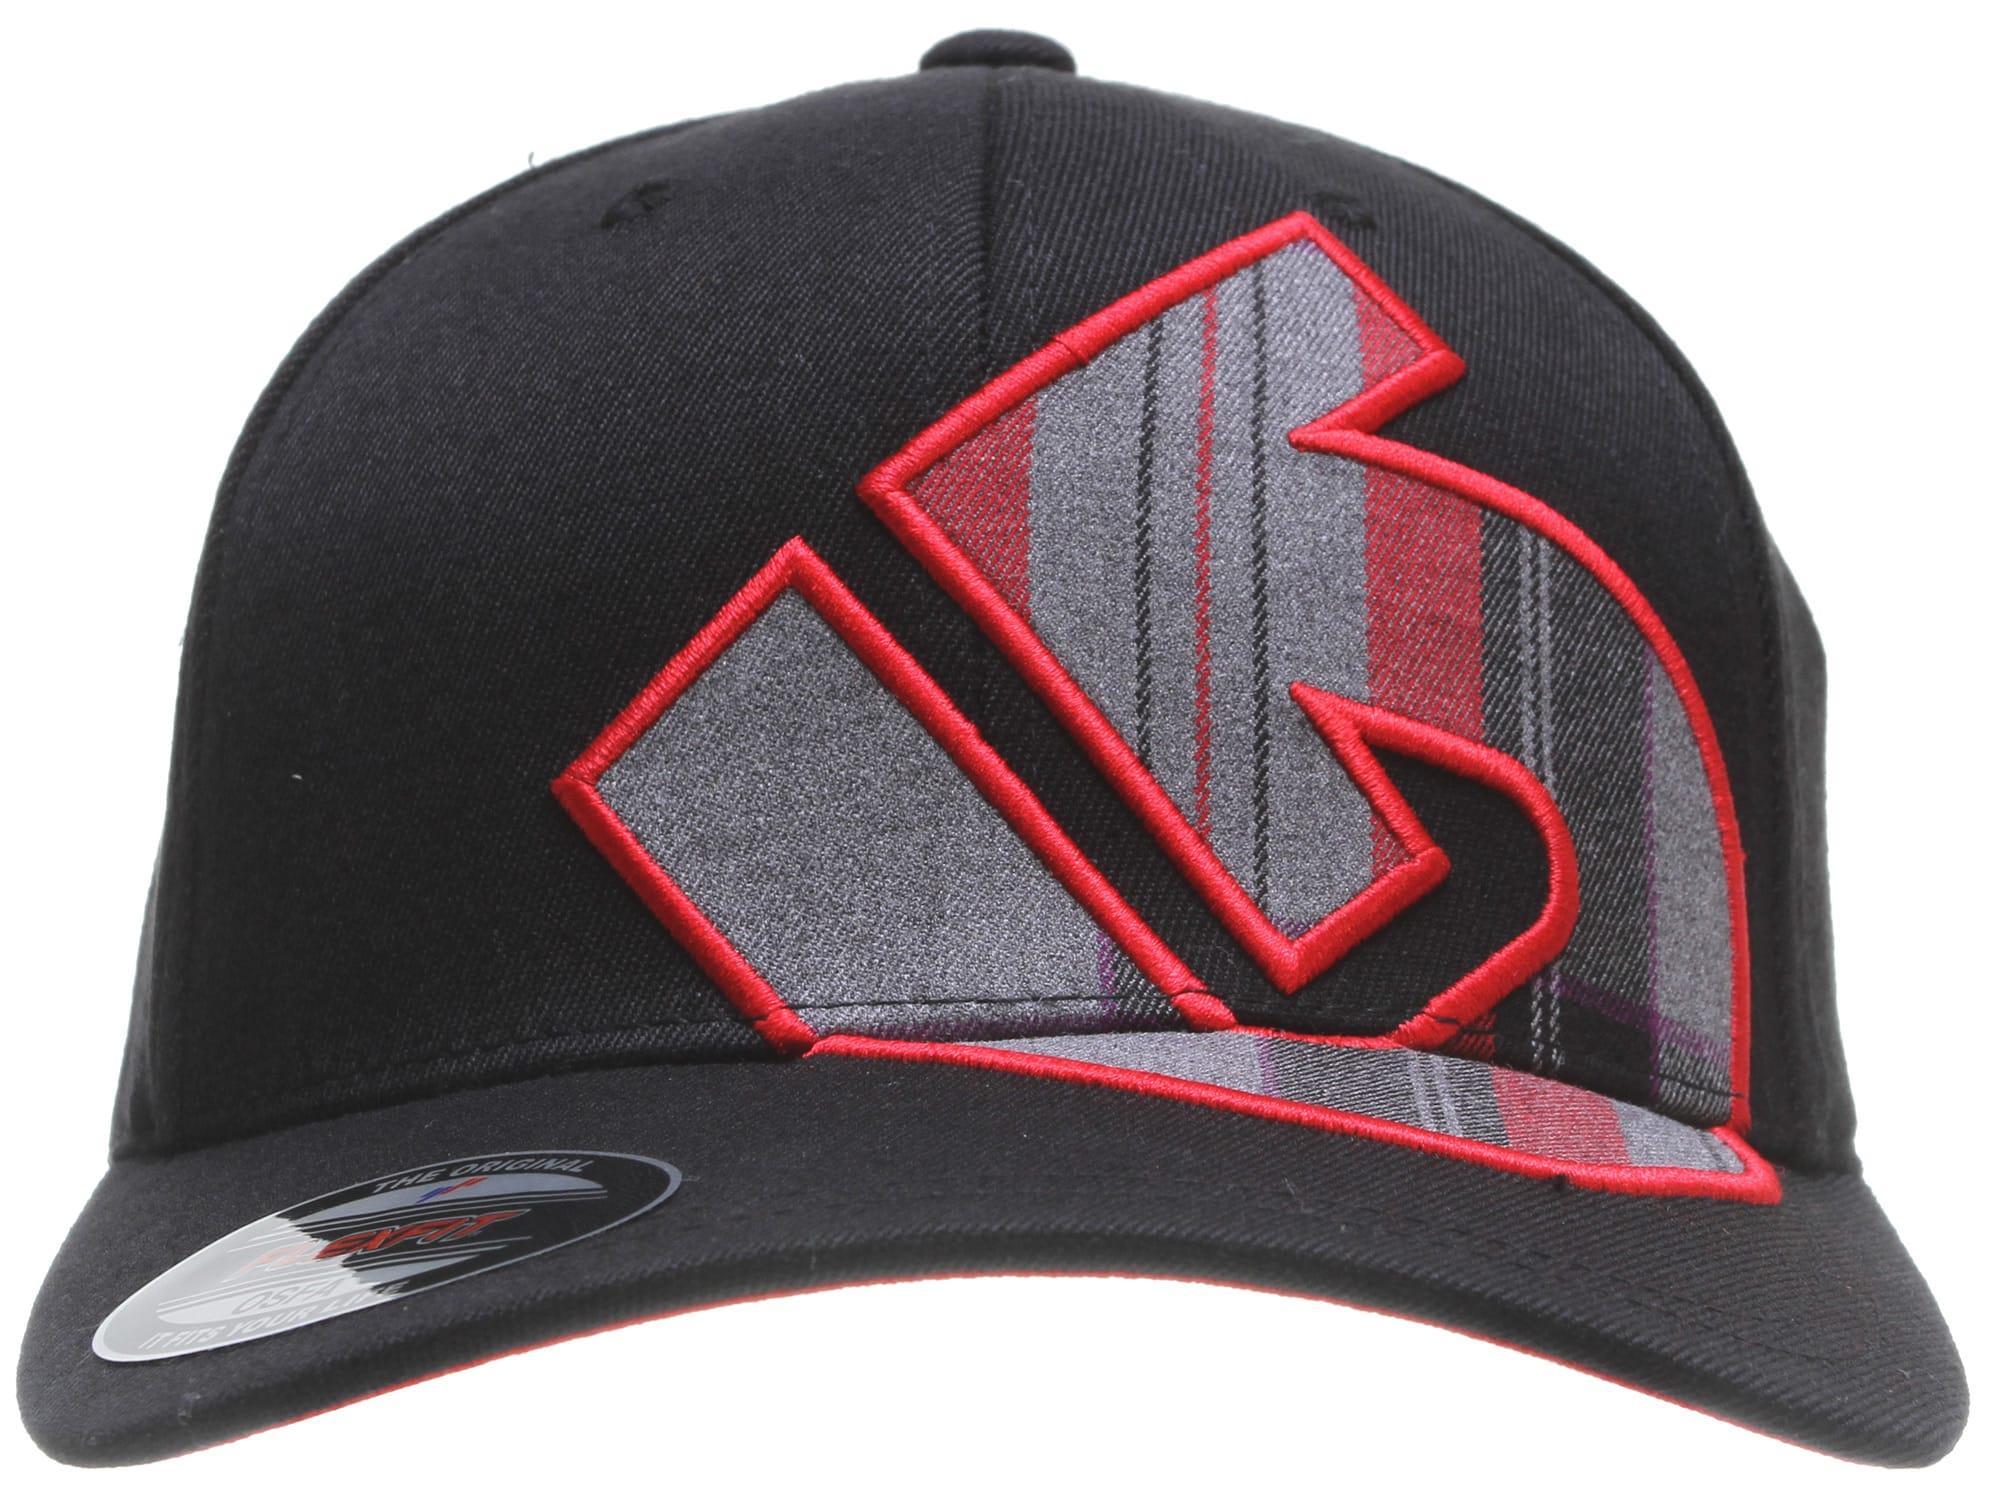 c13e1595819 Burton Slidestyle Flexfit Cap - thumbnail 1